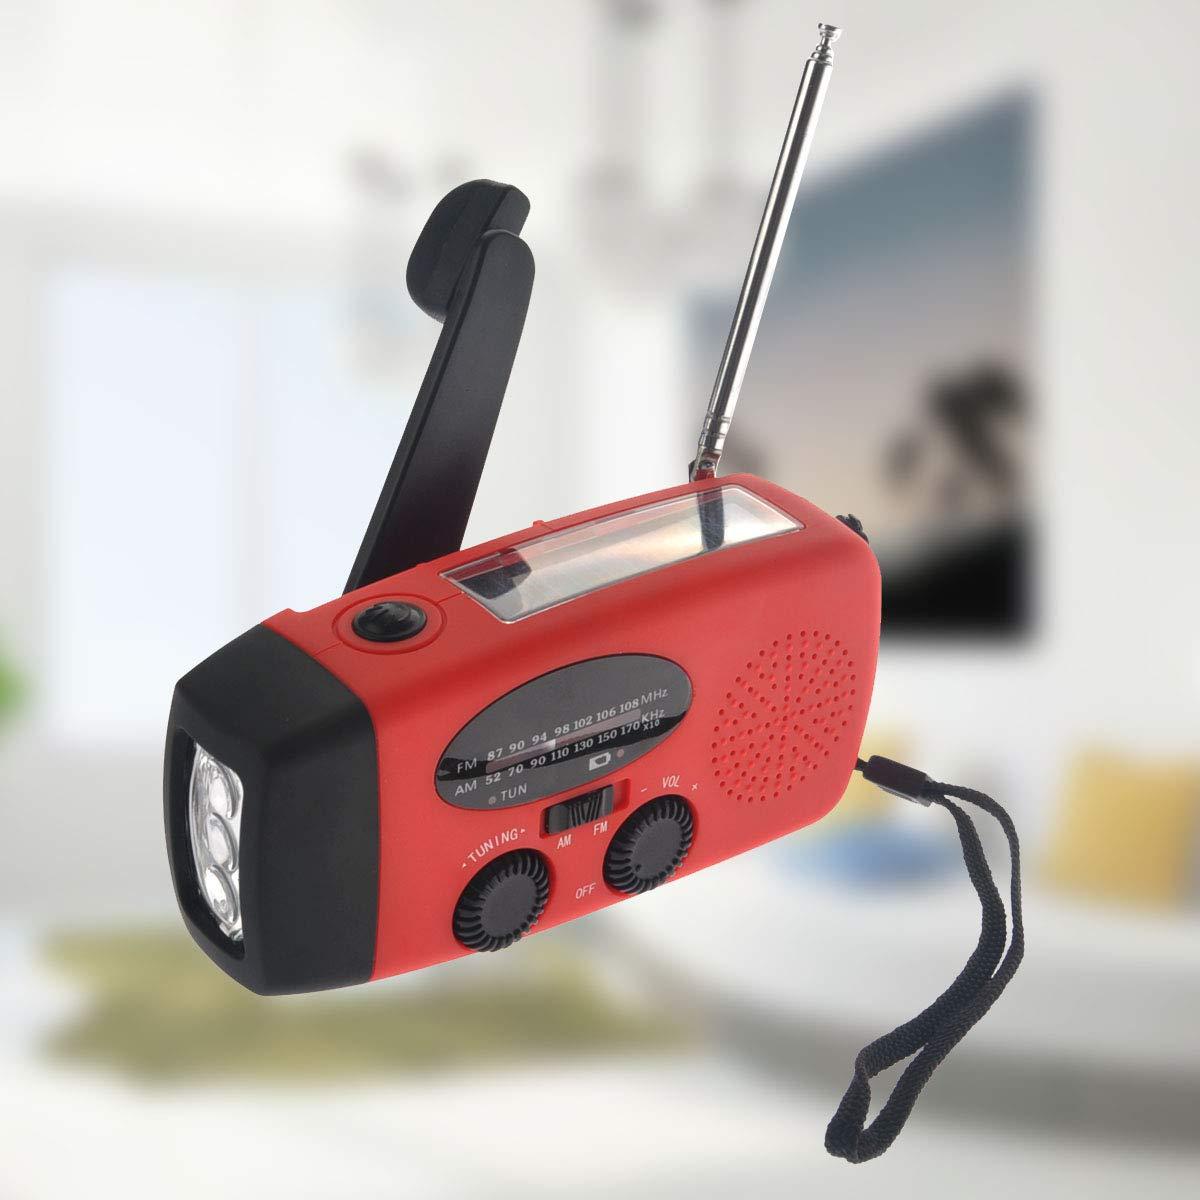 VOSAREA Emergency Solar Crank AM FM Camp Radio with LED Flashlight USB Output Port(Red) by VOSAREA (Image #6)